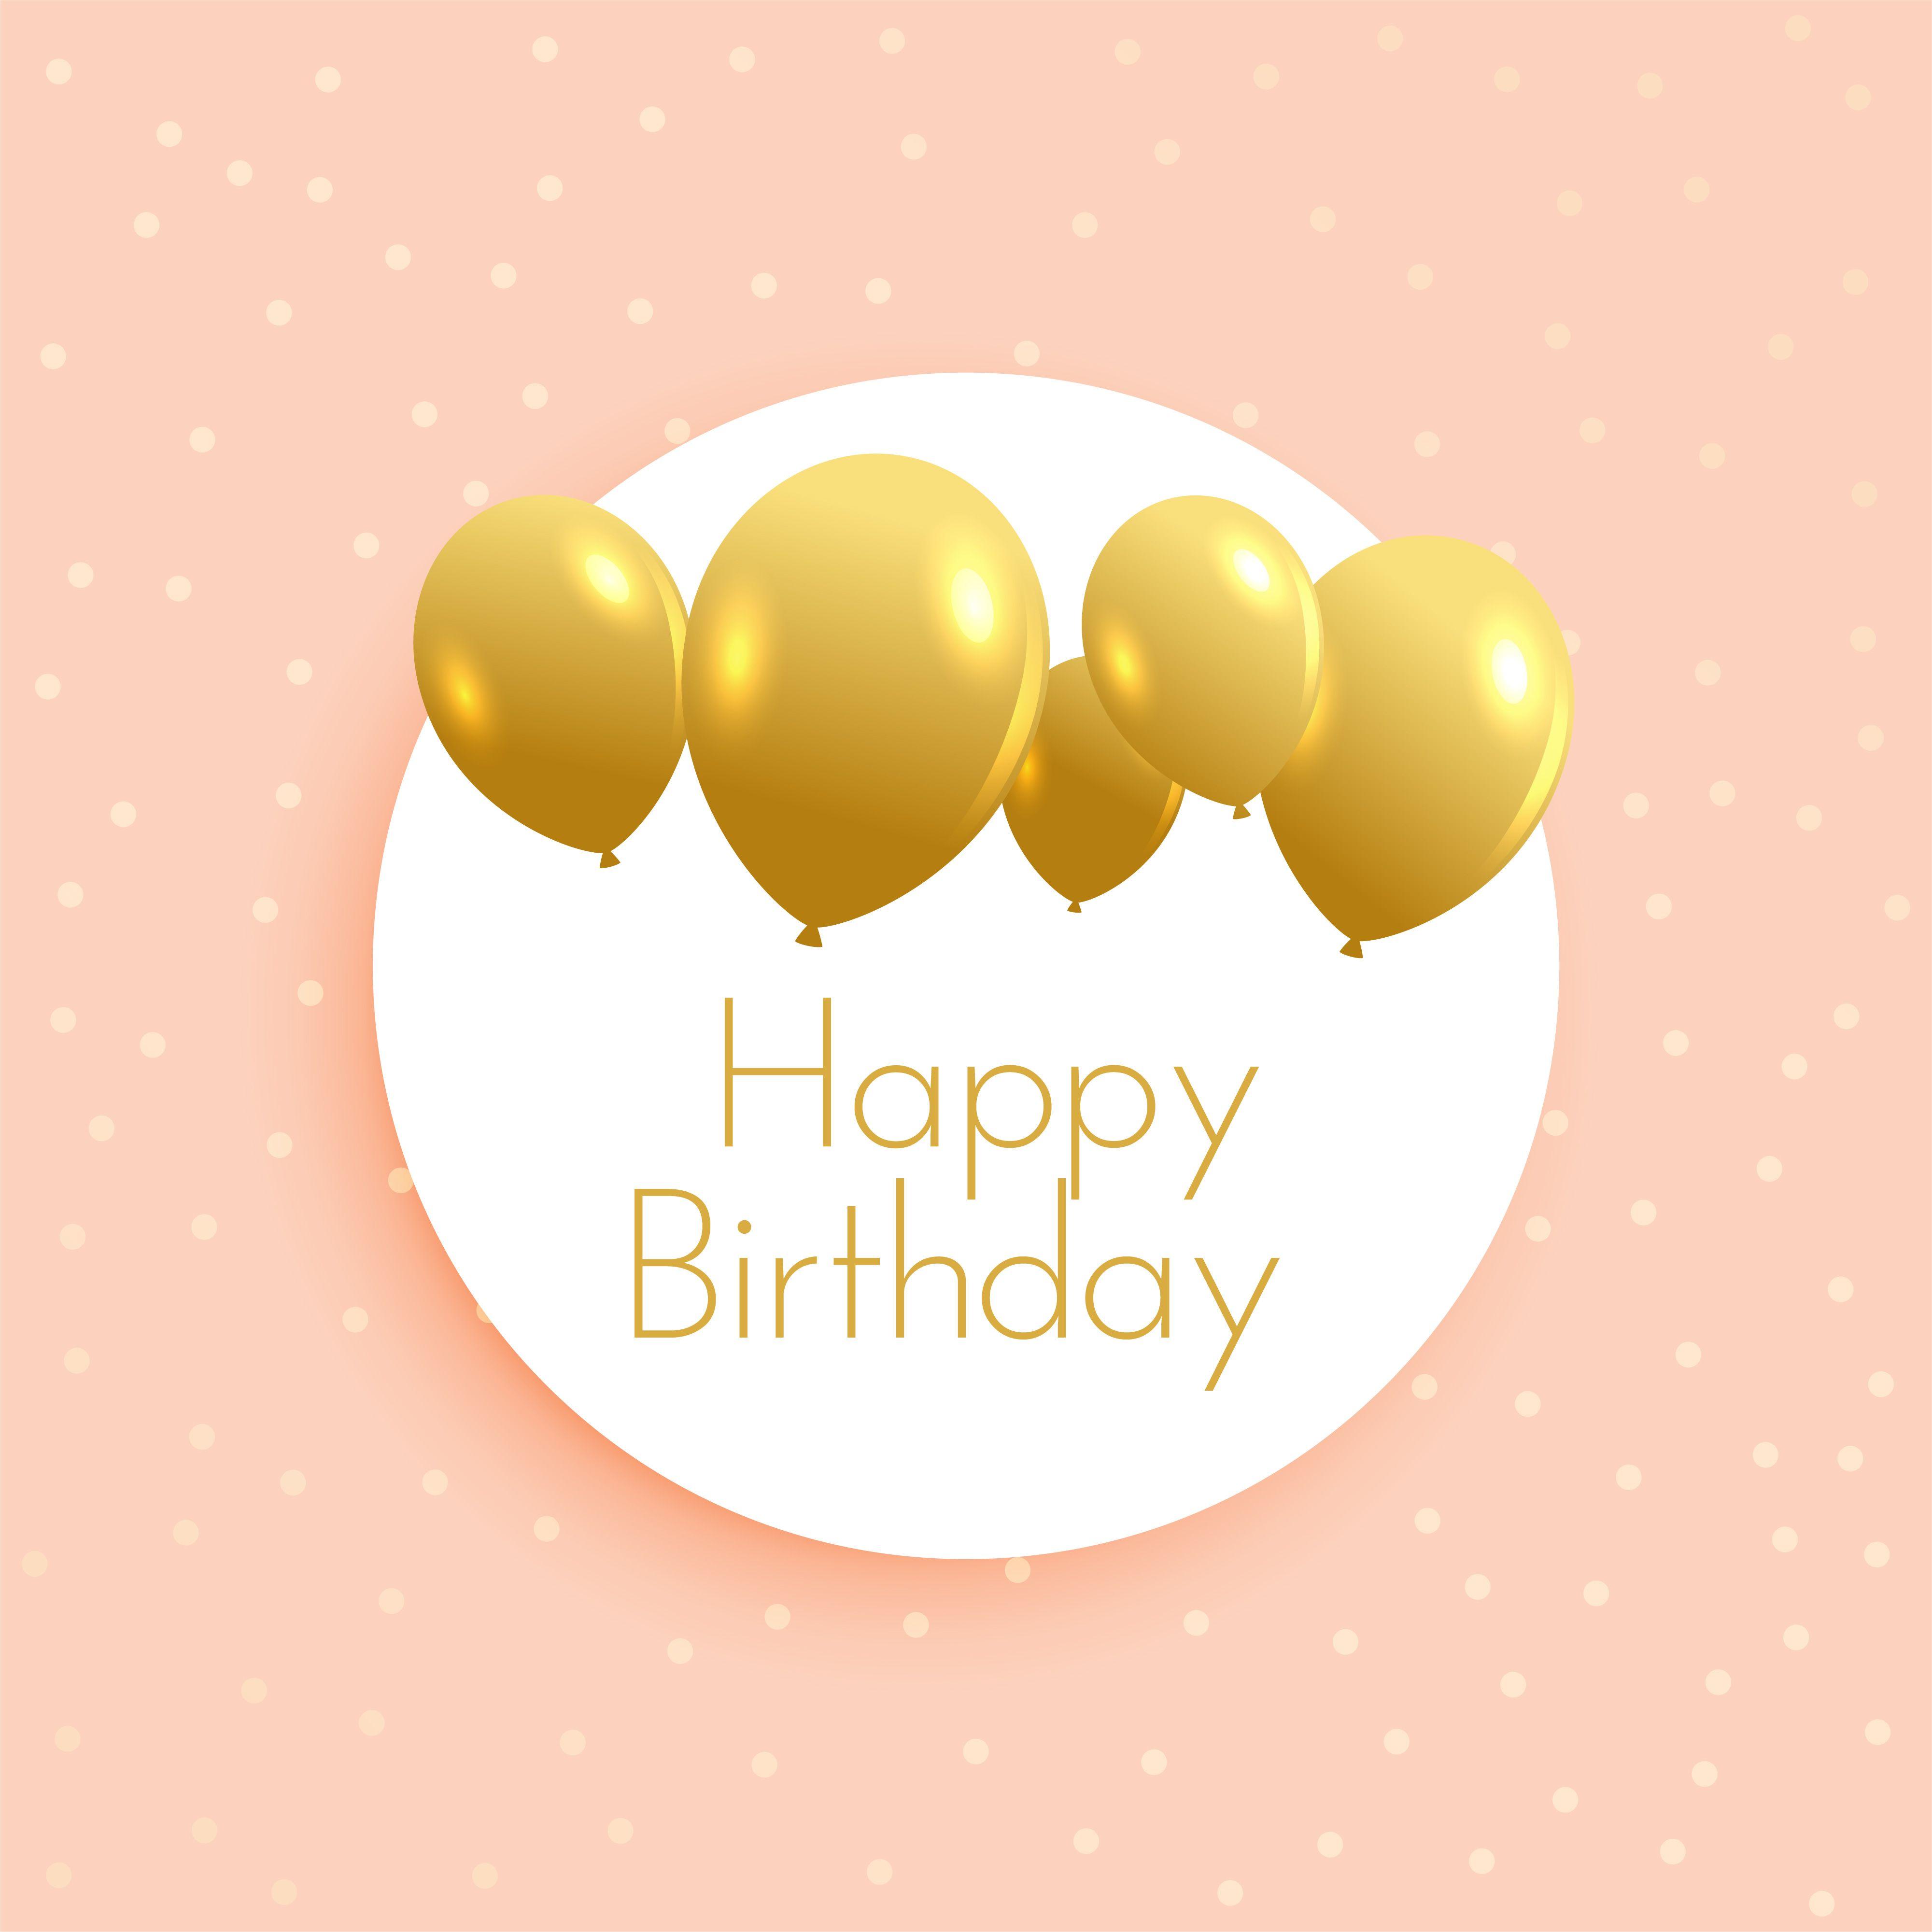 Soft birthday background with golden balloons birthday pinterest